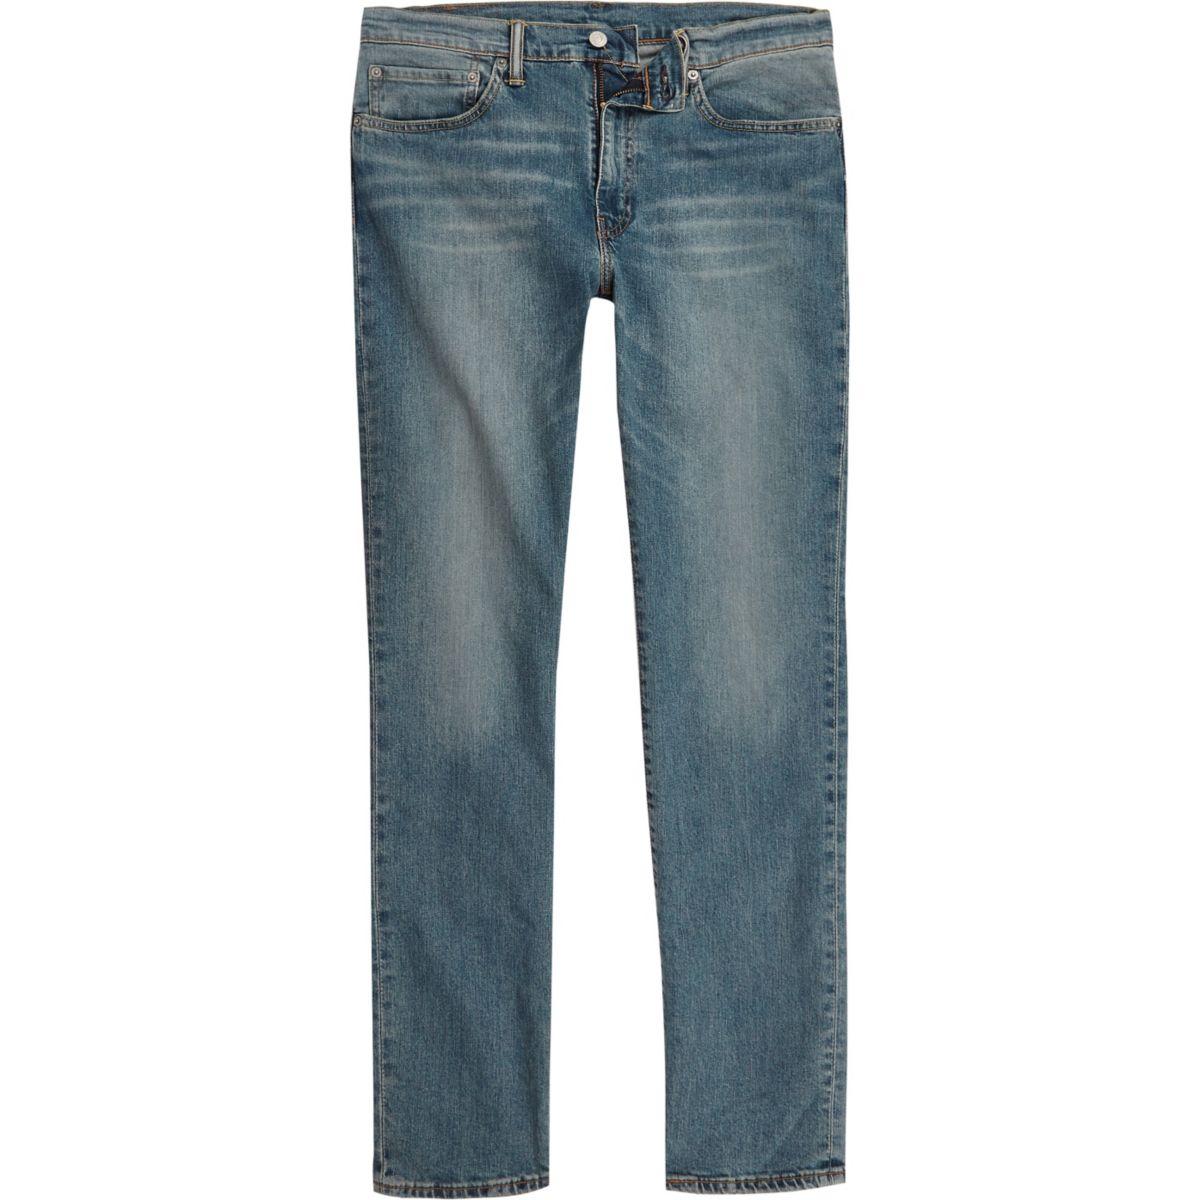 Levi's blue 511 distressed slim fit jeans